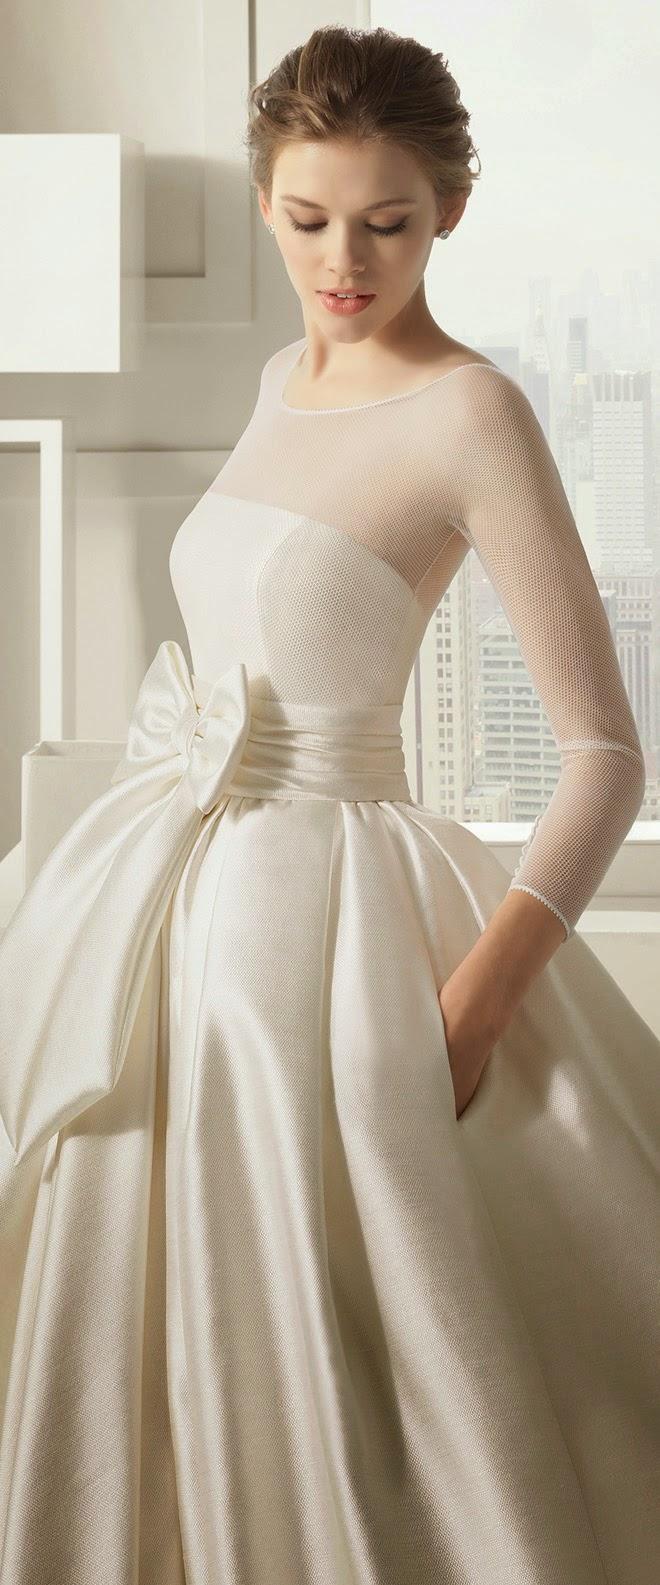 Best Wedding Dresses of 2014 - Belle the Magazine . The Wedding Blog ...